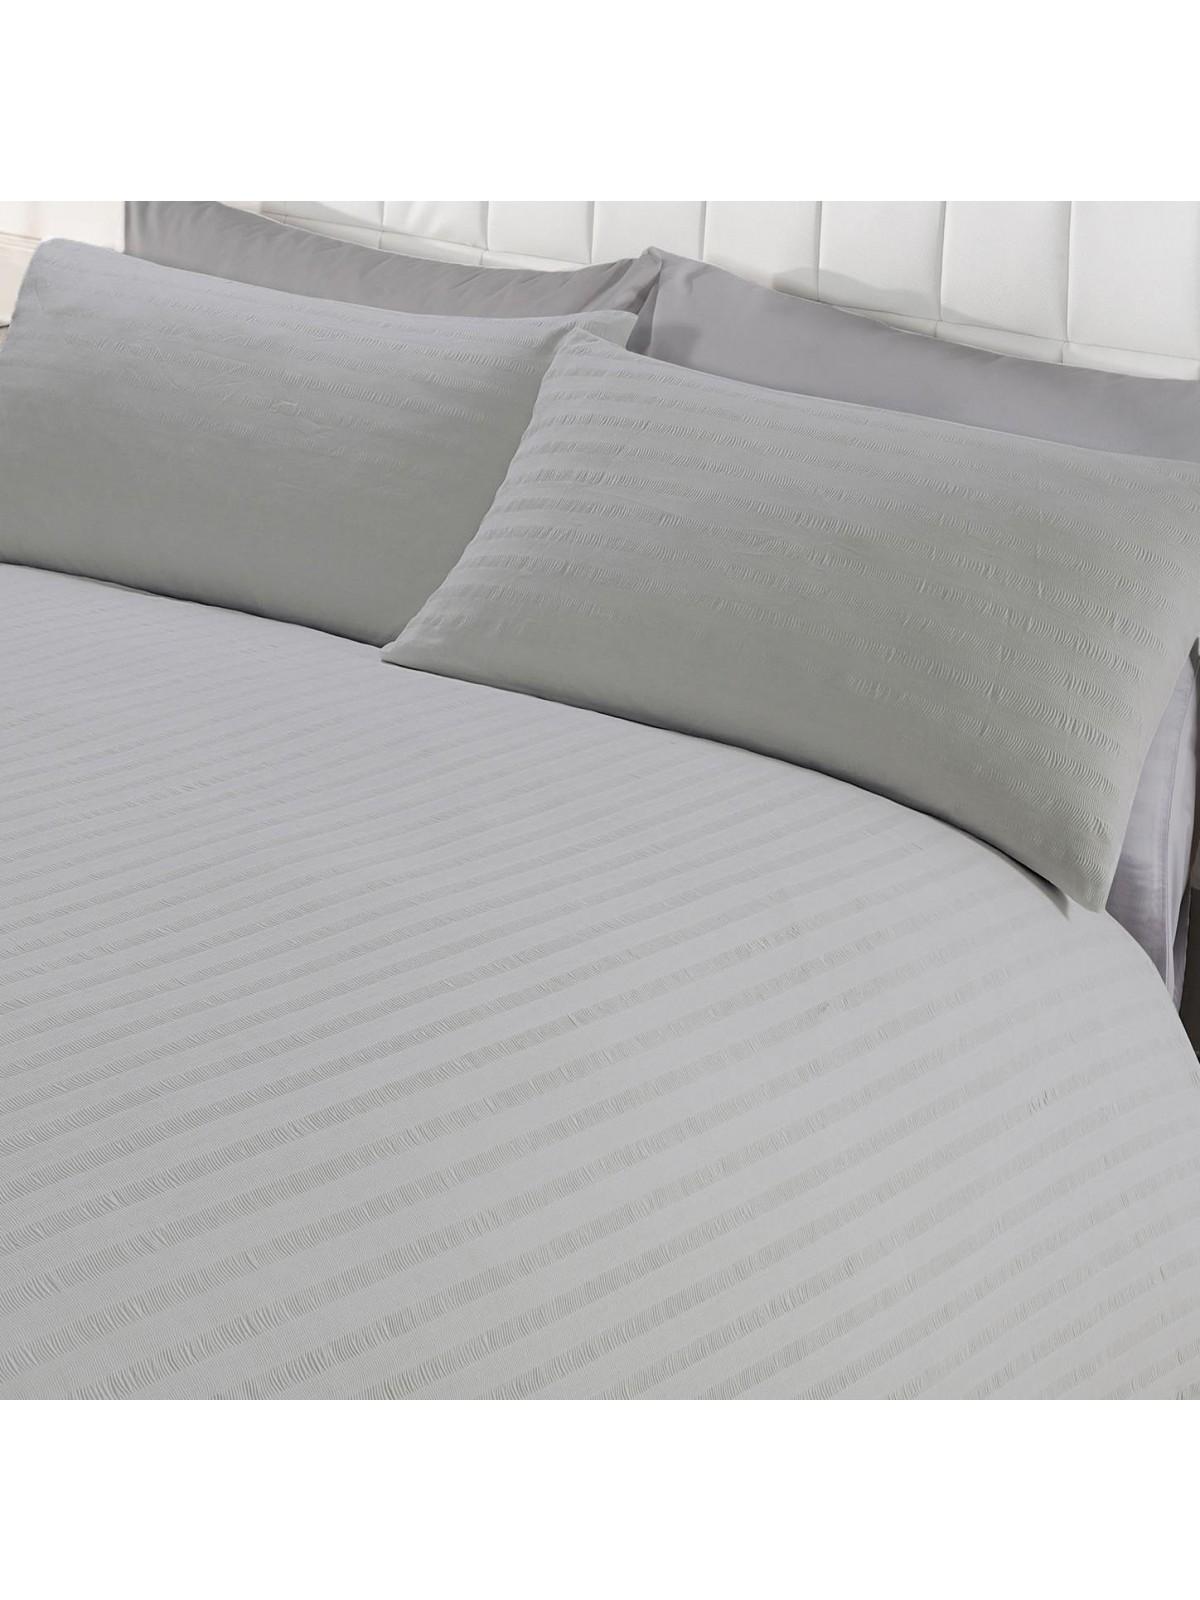 stripe duvet cover linen mill dove drapes hadlow dreams set seersucker bed blue